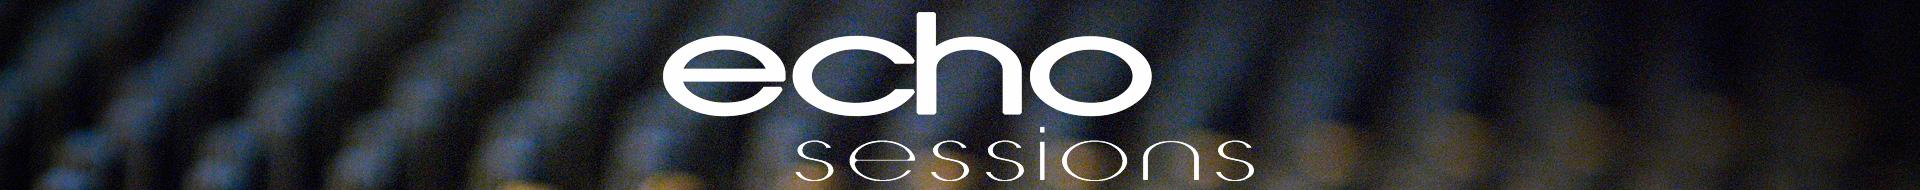 echo SESSIONS